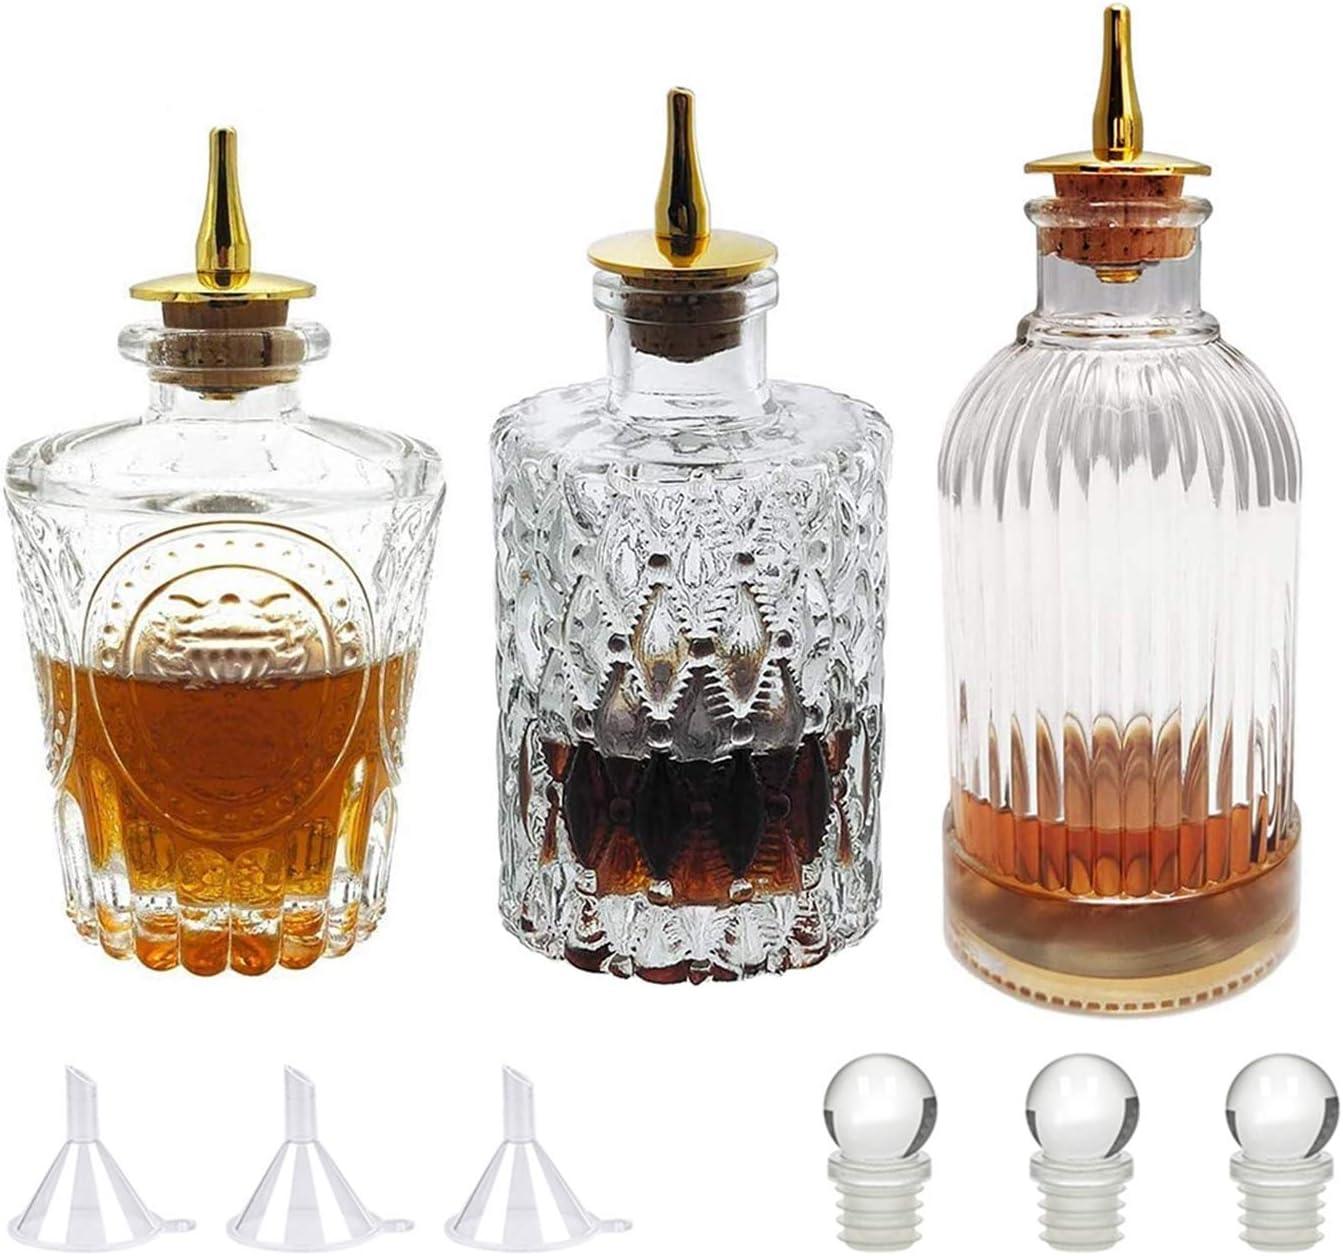 Bitters Bottle Set Glass Vintage Bottle Decorative Bottles With Zinc Alloy Dash Top Great Bottle For Your Bitters 3 Amazon Co Uk Diy Tools